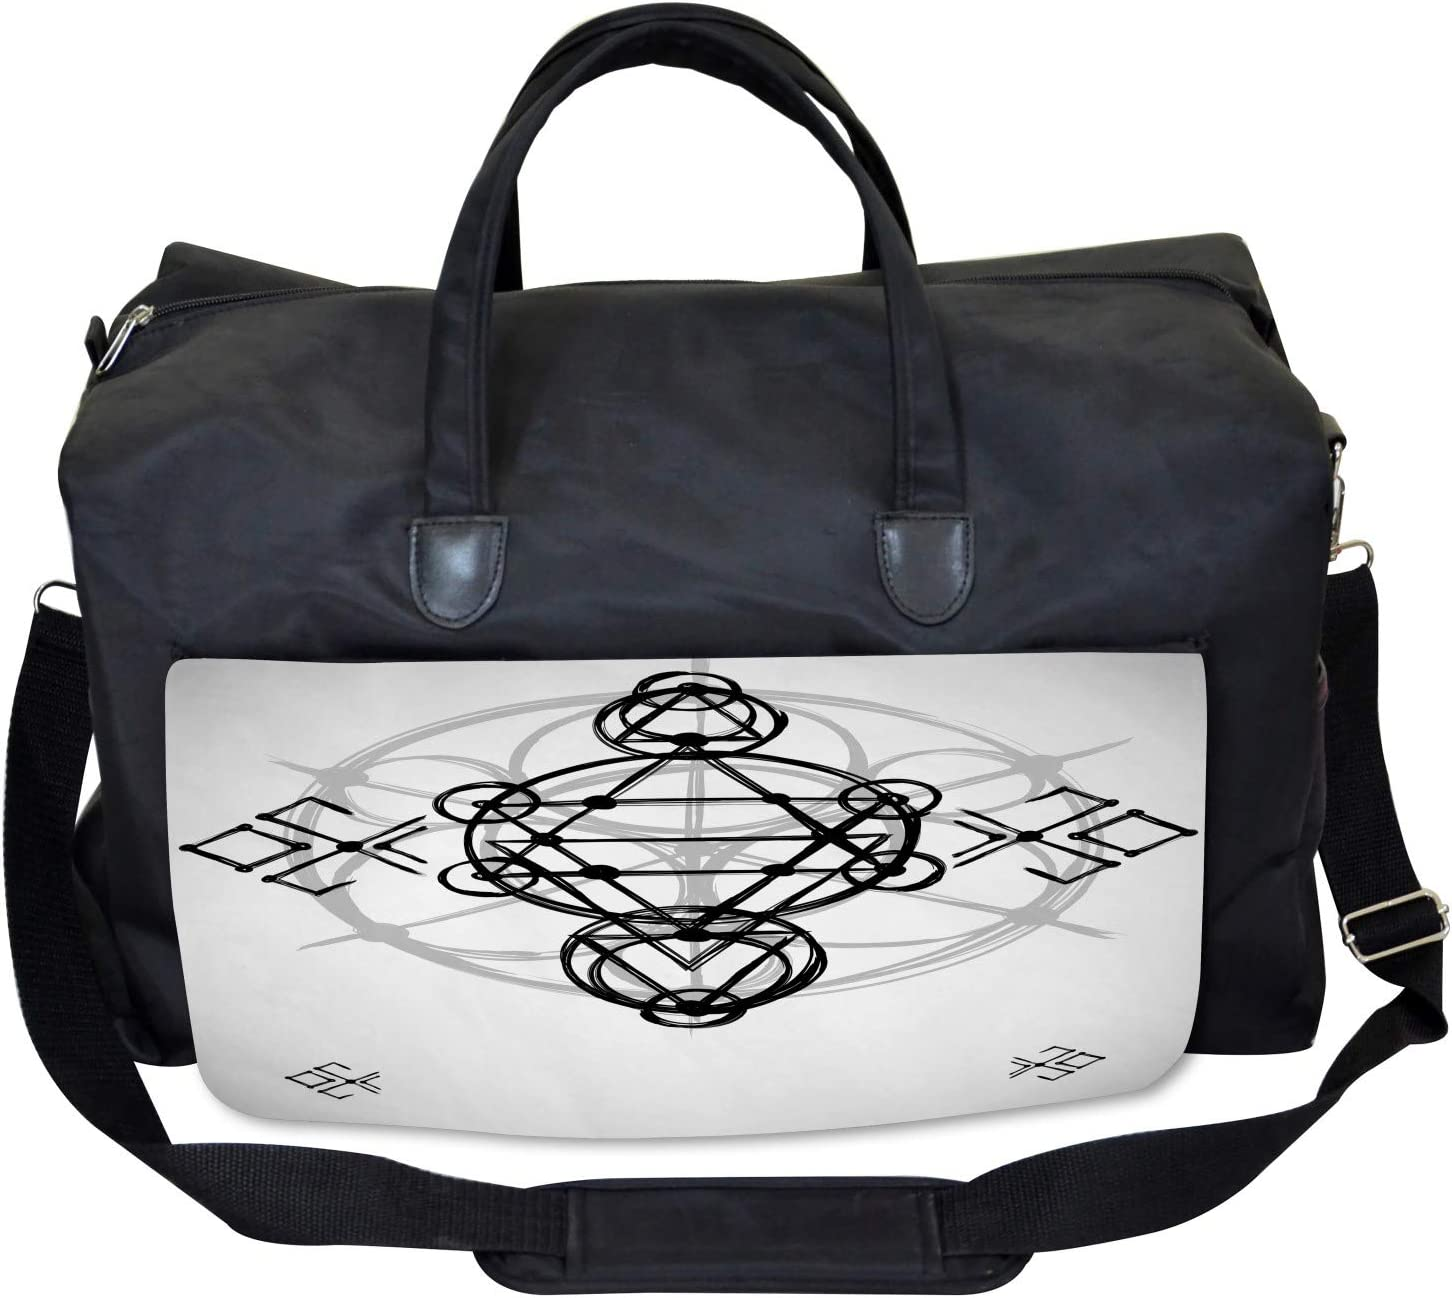 Ambesonne Gray Gym Bag Ancient Sketch Illustration Large Weekender Carry-on